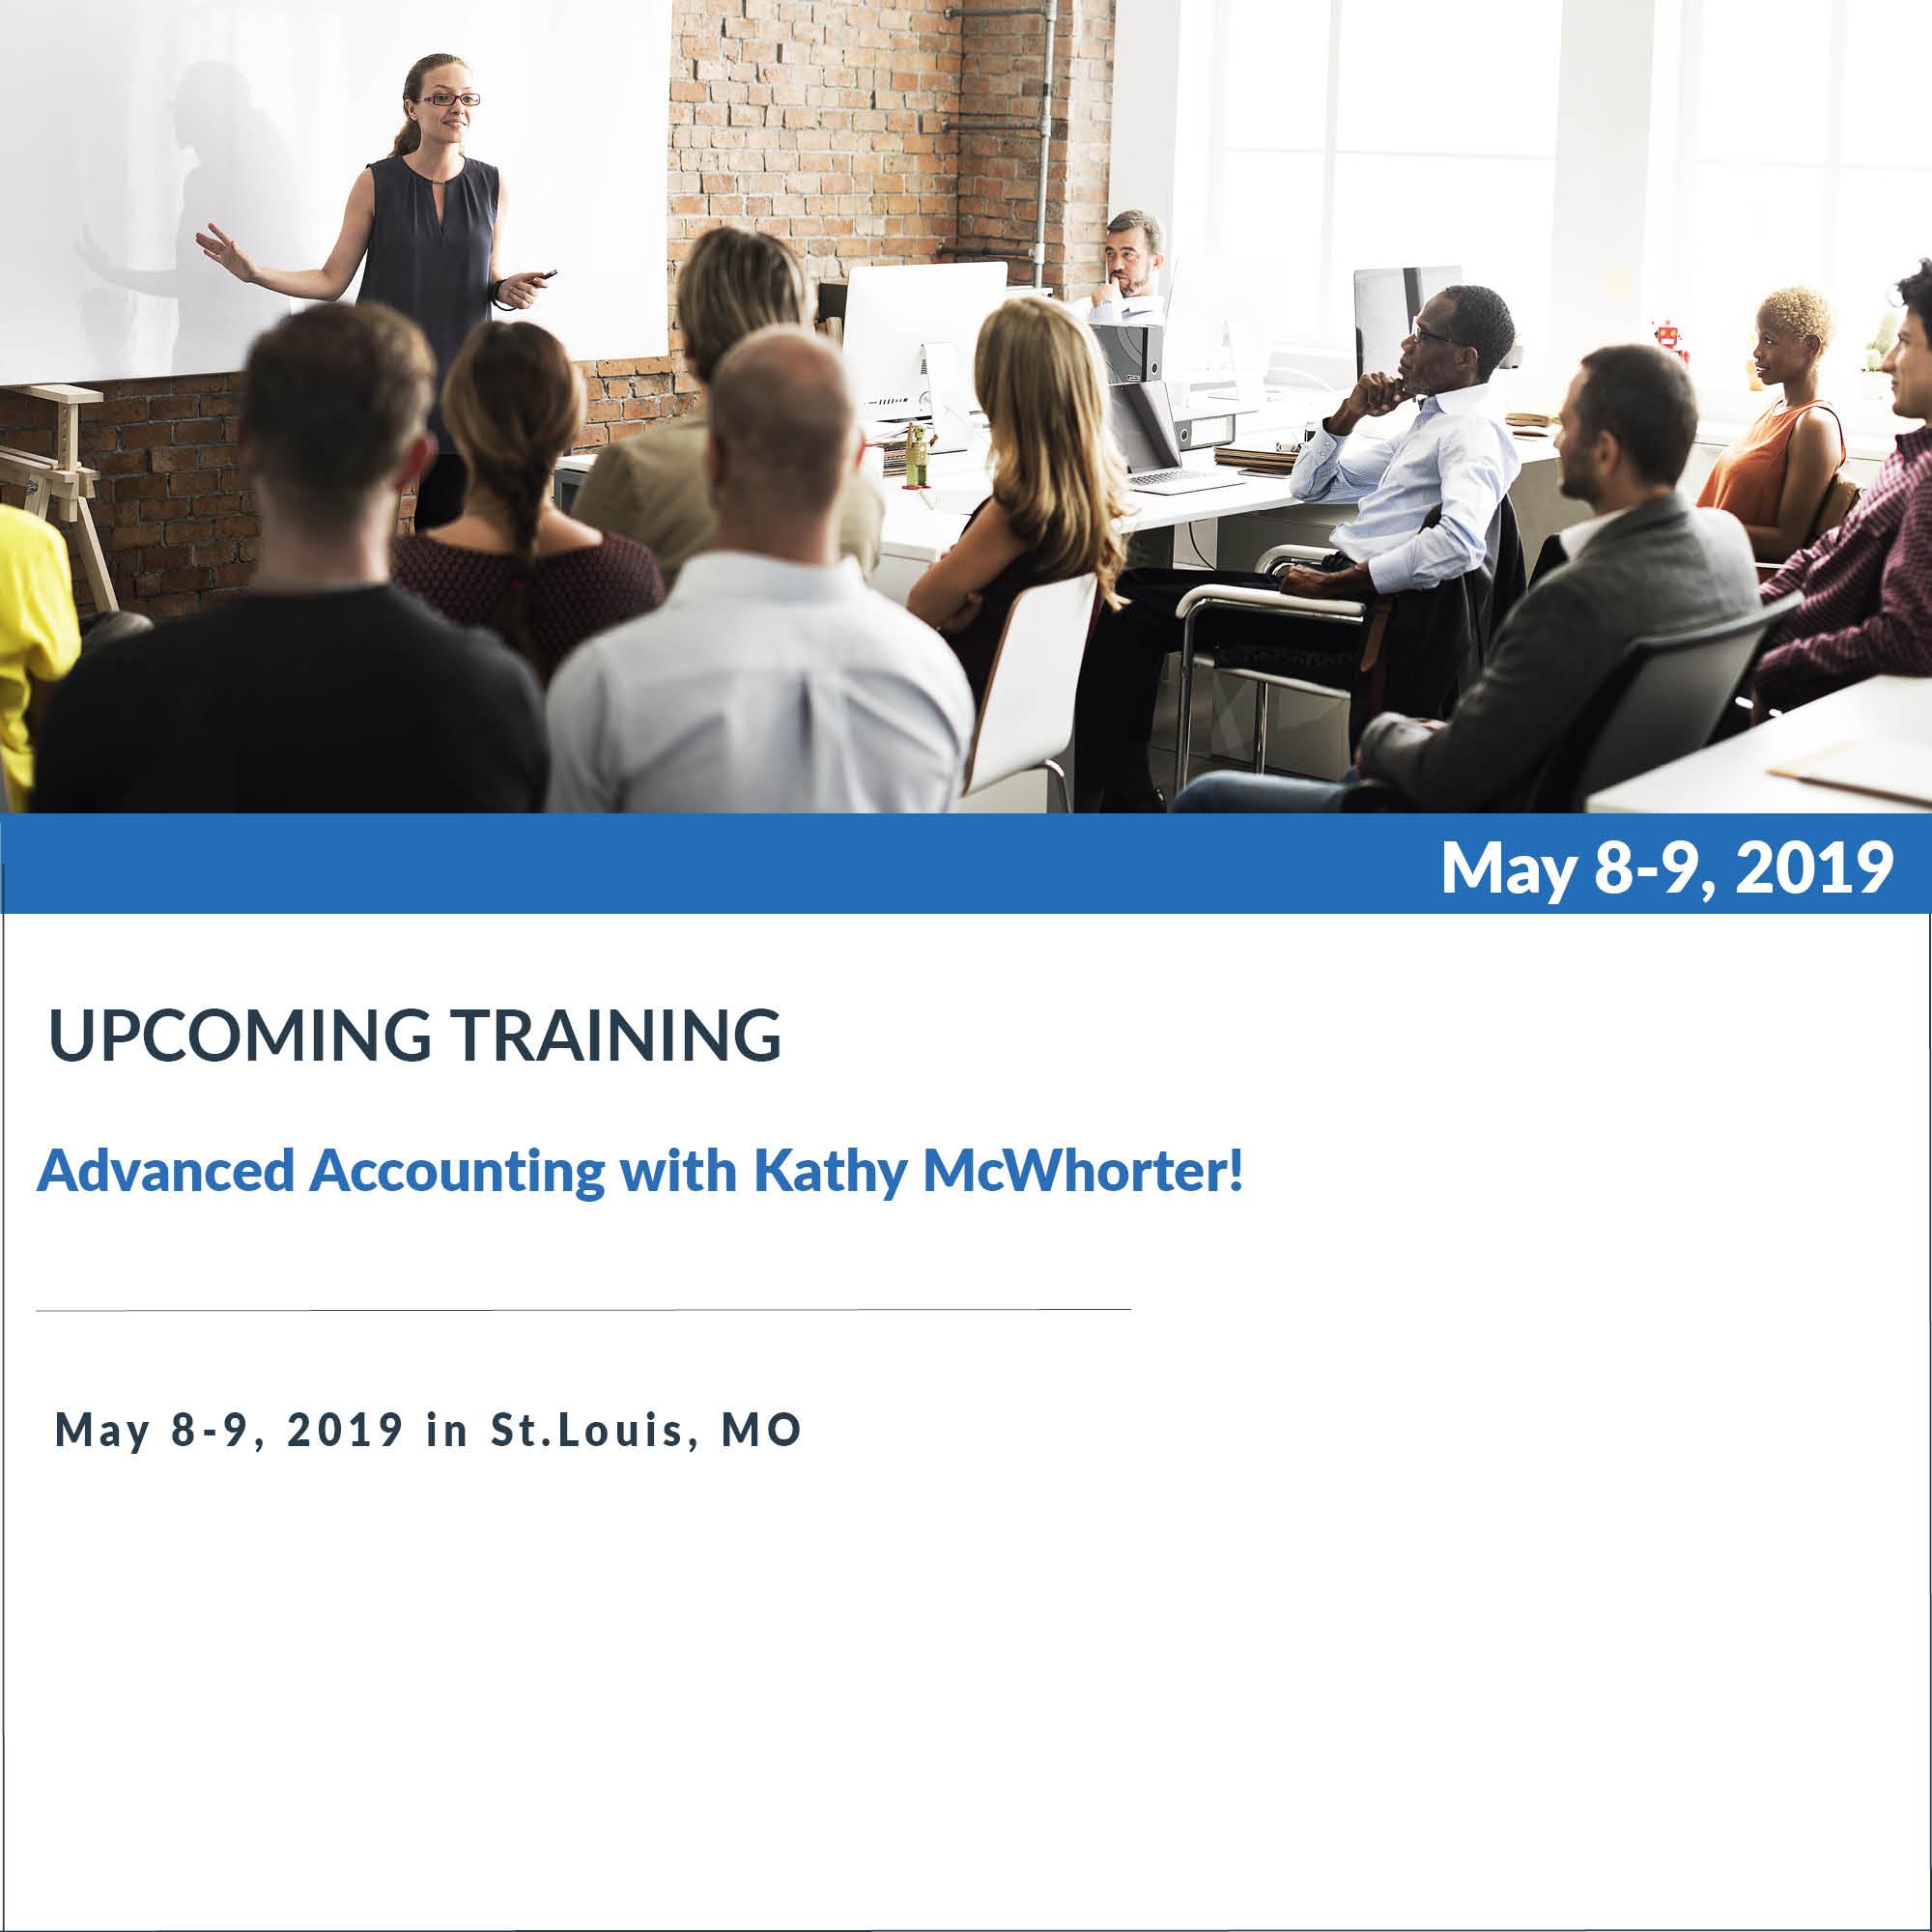 Aspire Training_May 8-9, 2019